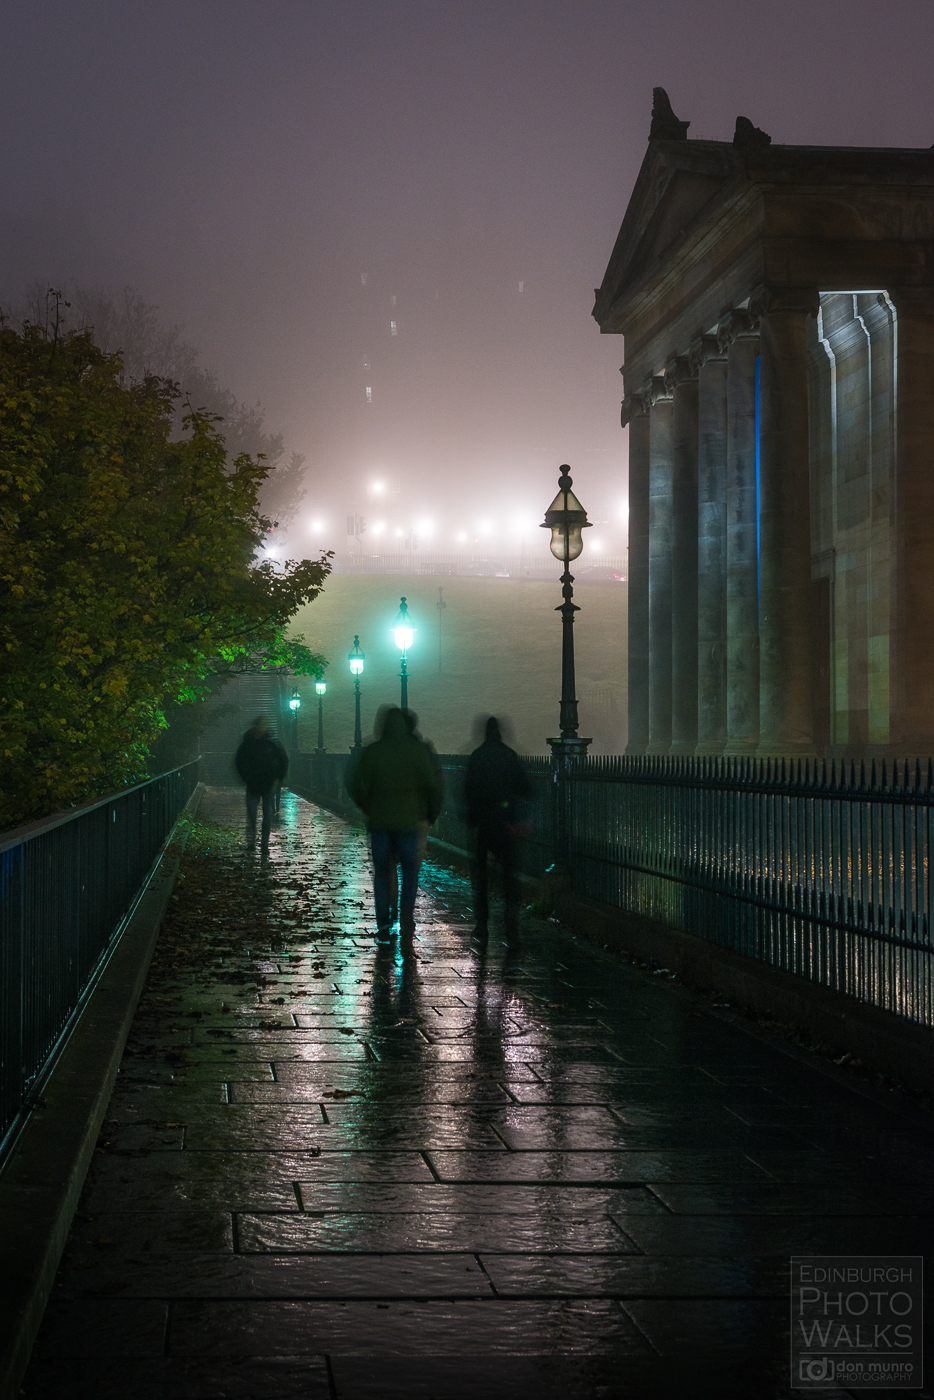 Edinburgh Area Edinburgh Photo Walks